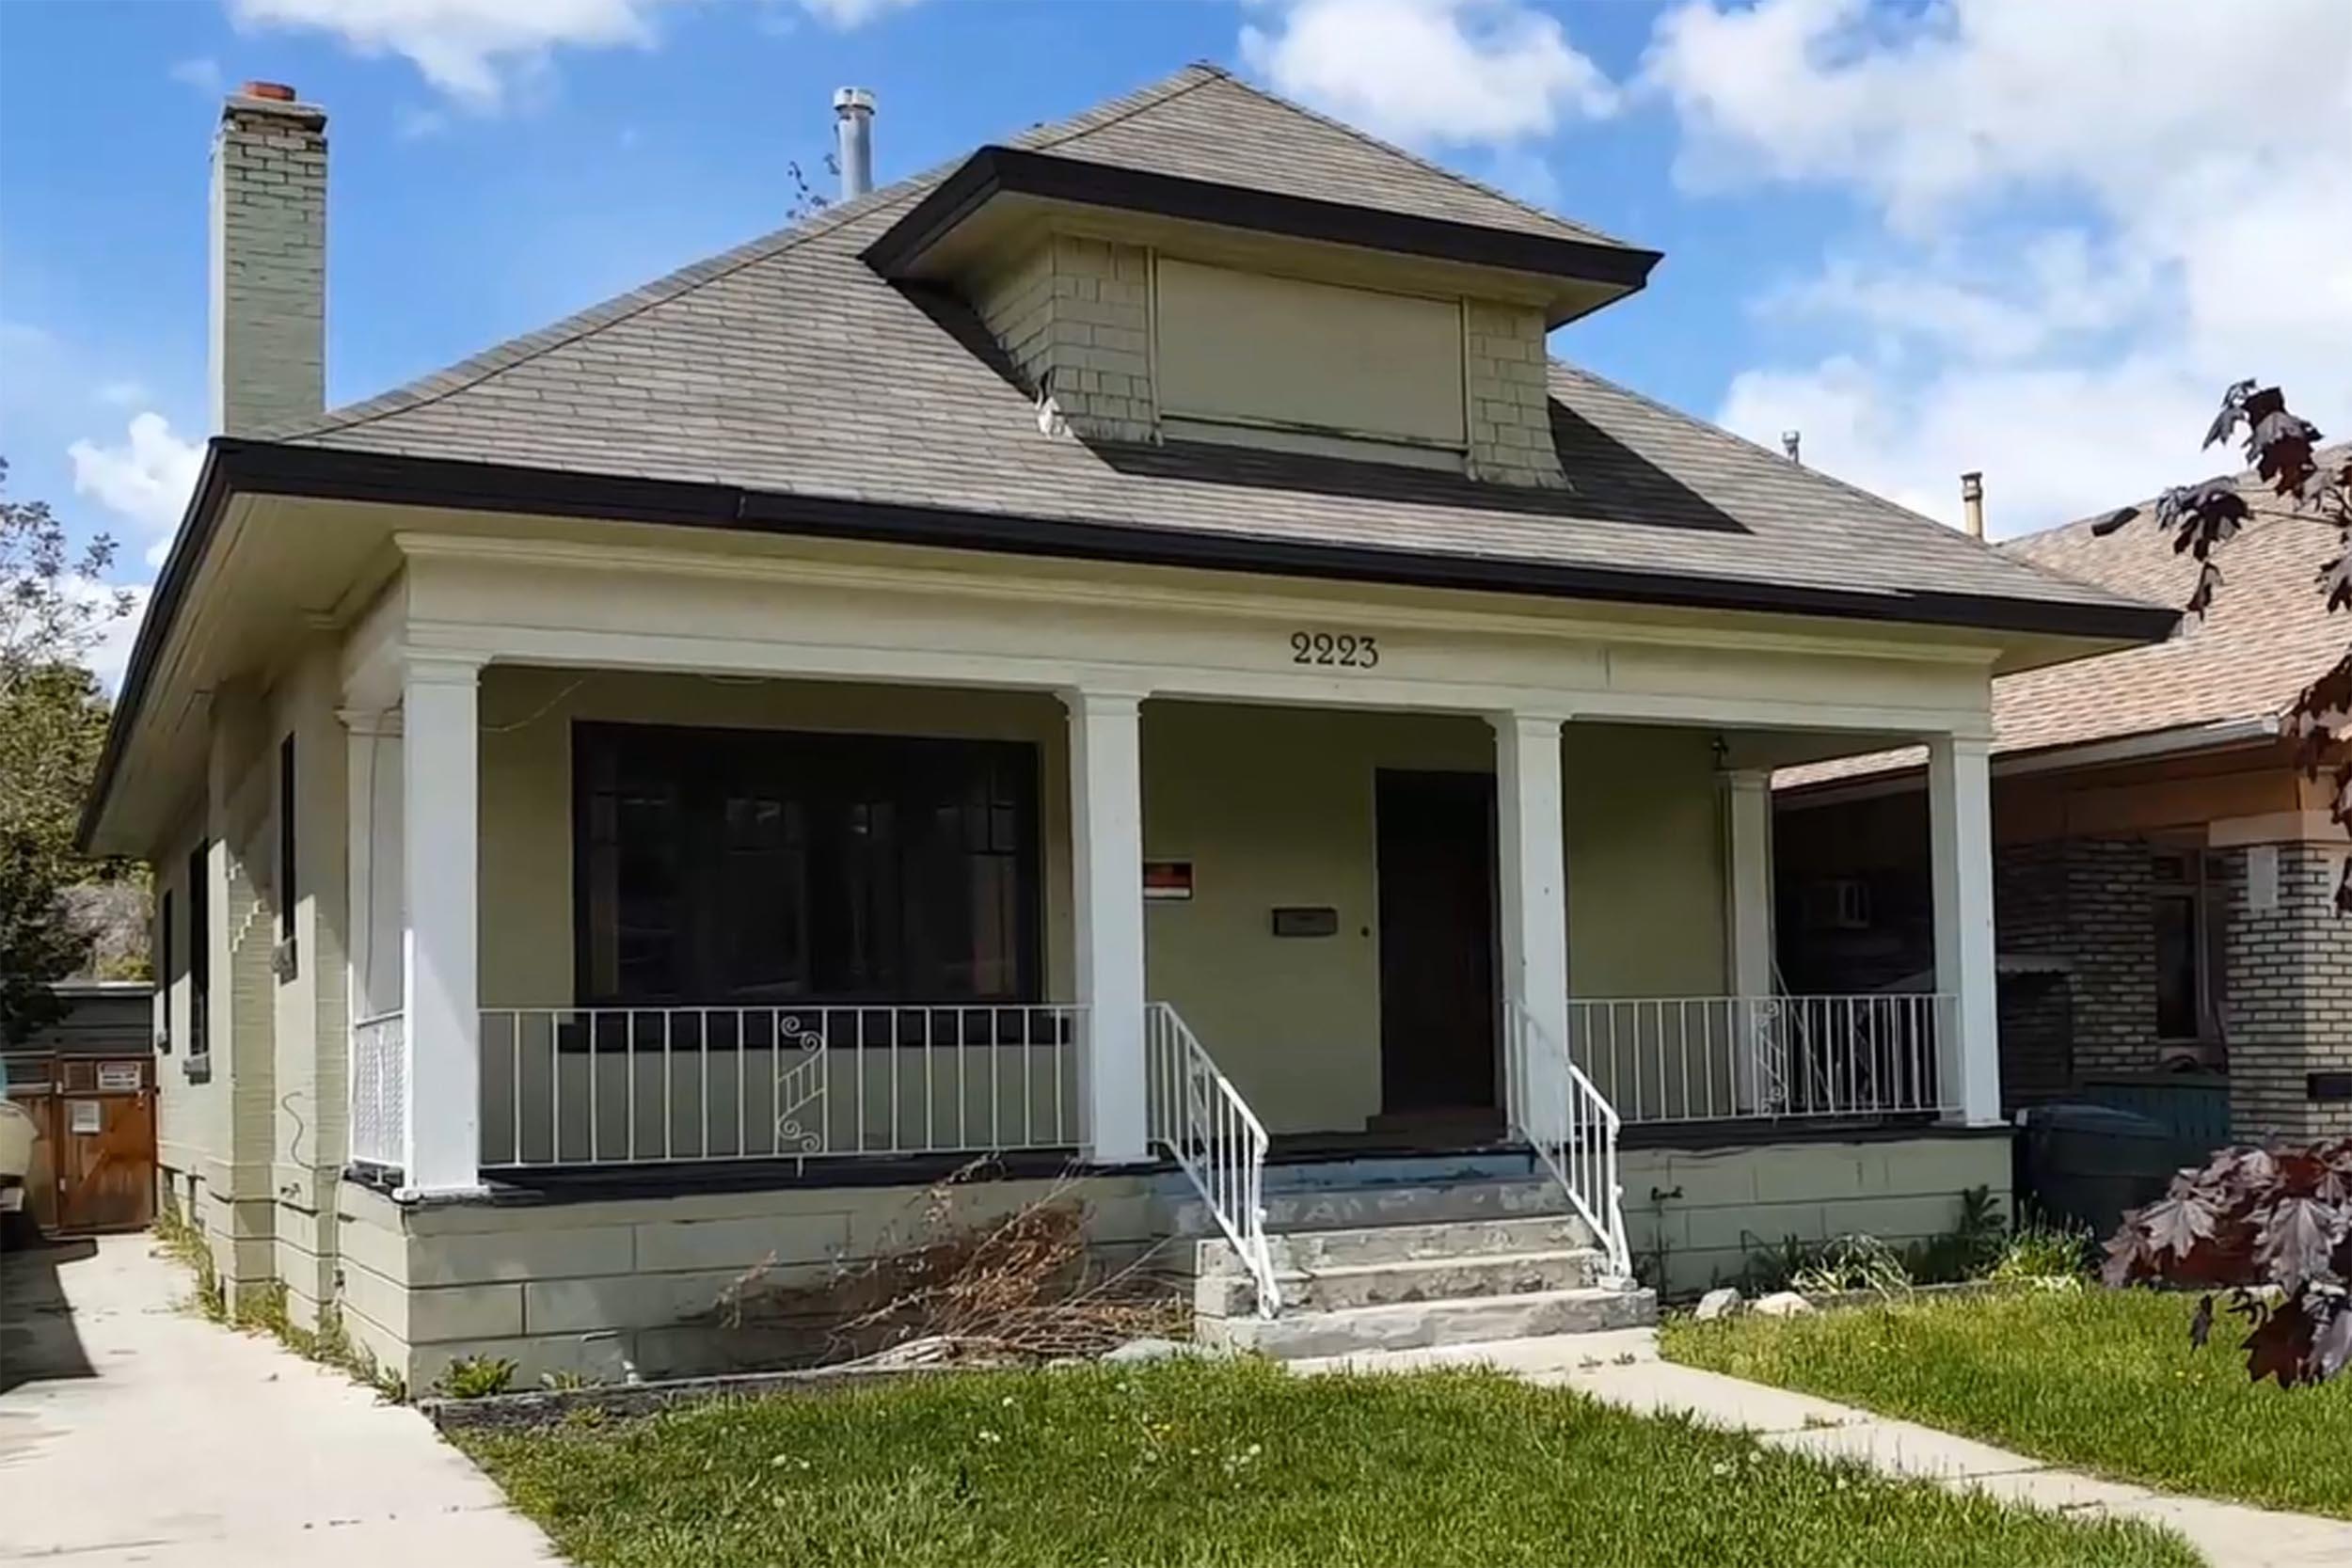 THE HIBBS HOUSE PROJECT:  A Craftsman Restoration